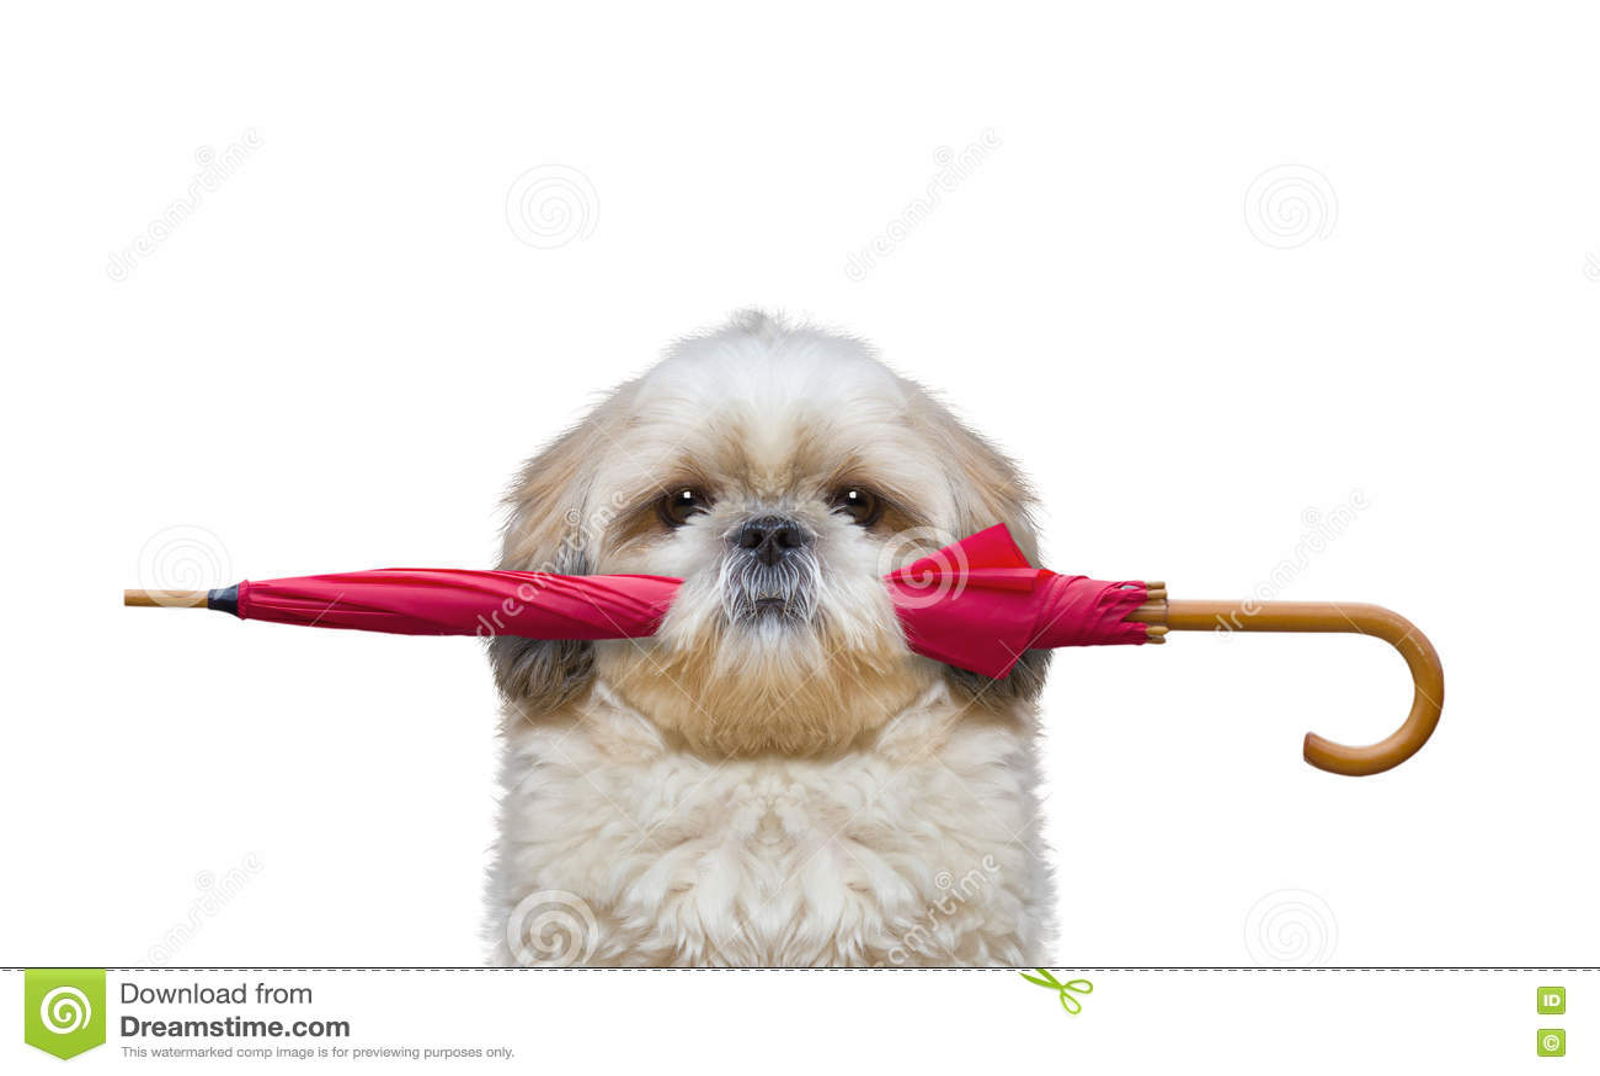 cute dog royalty free stock image cartoondealer com Dog Clip Art sleeping dog clipart